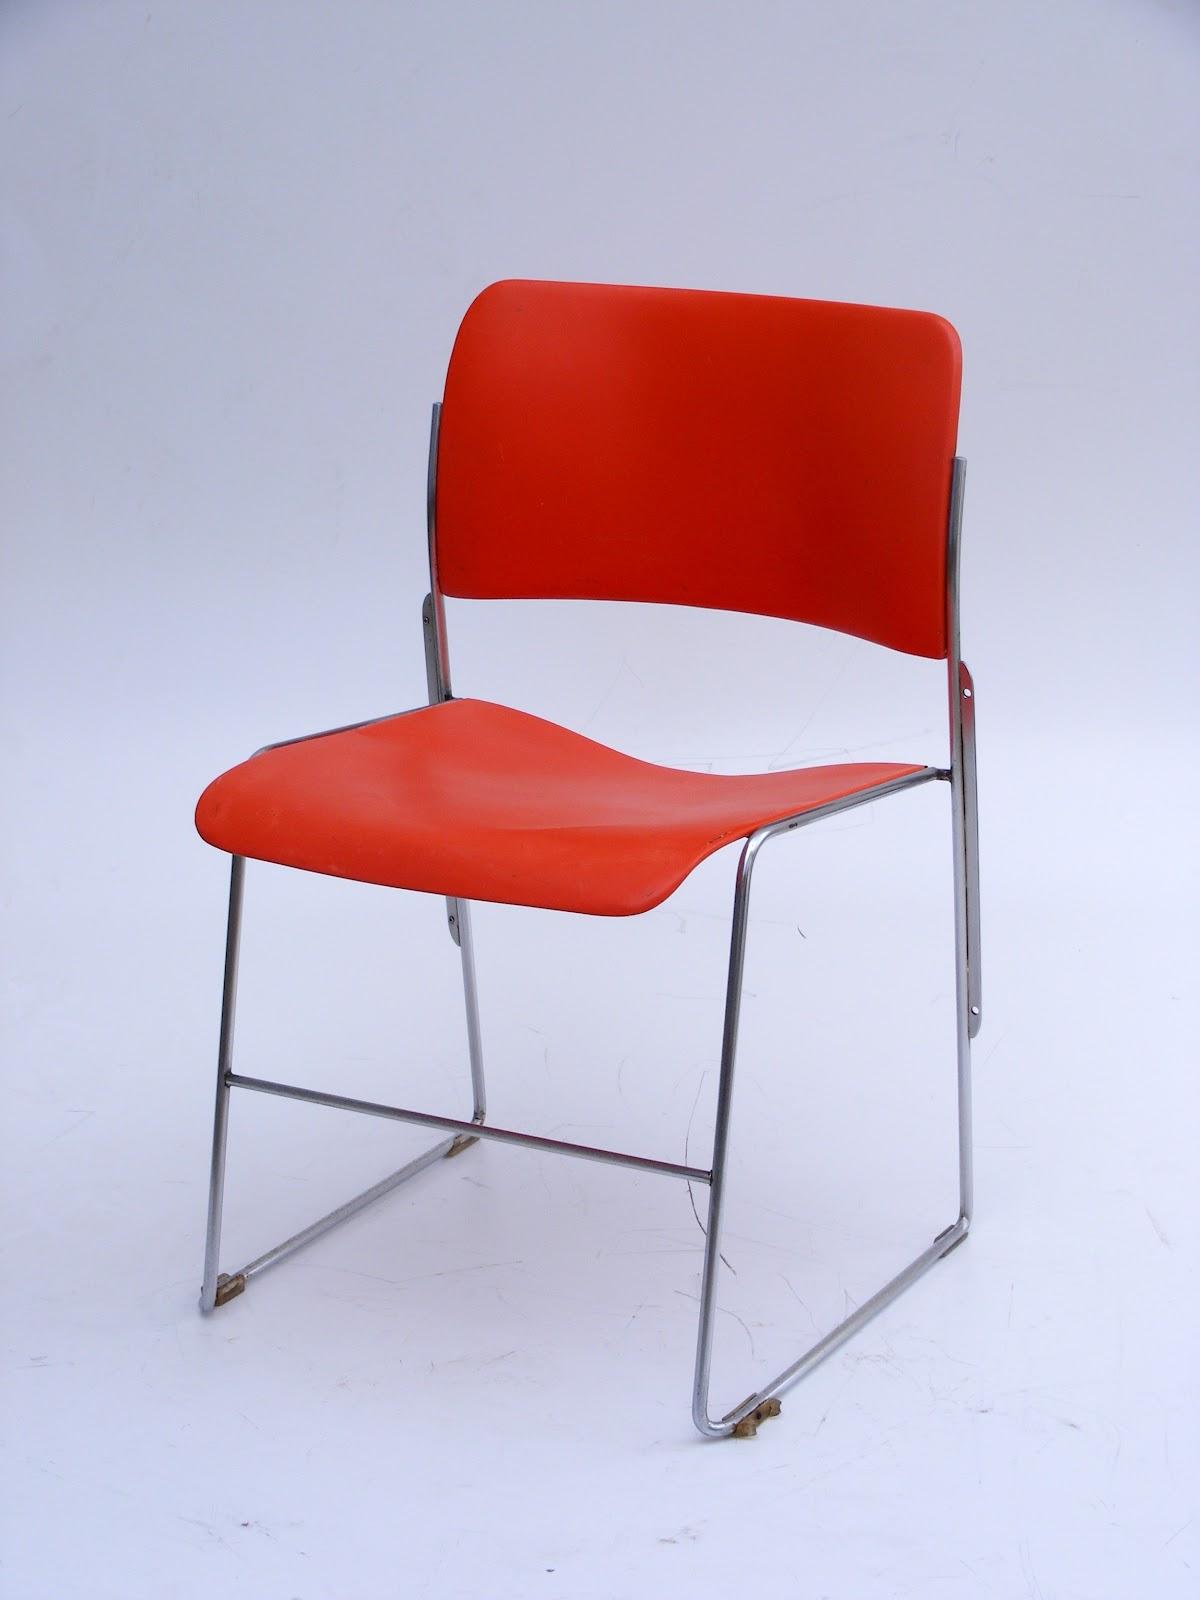 david rowland metal chair lounge chairs walmart vamp furniture this weeks new vintage at